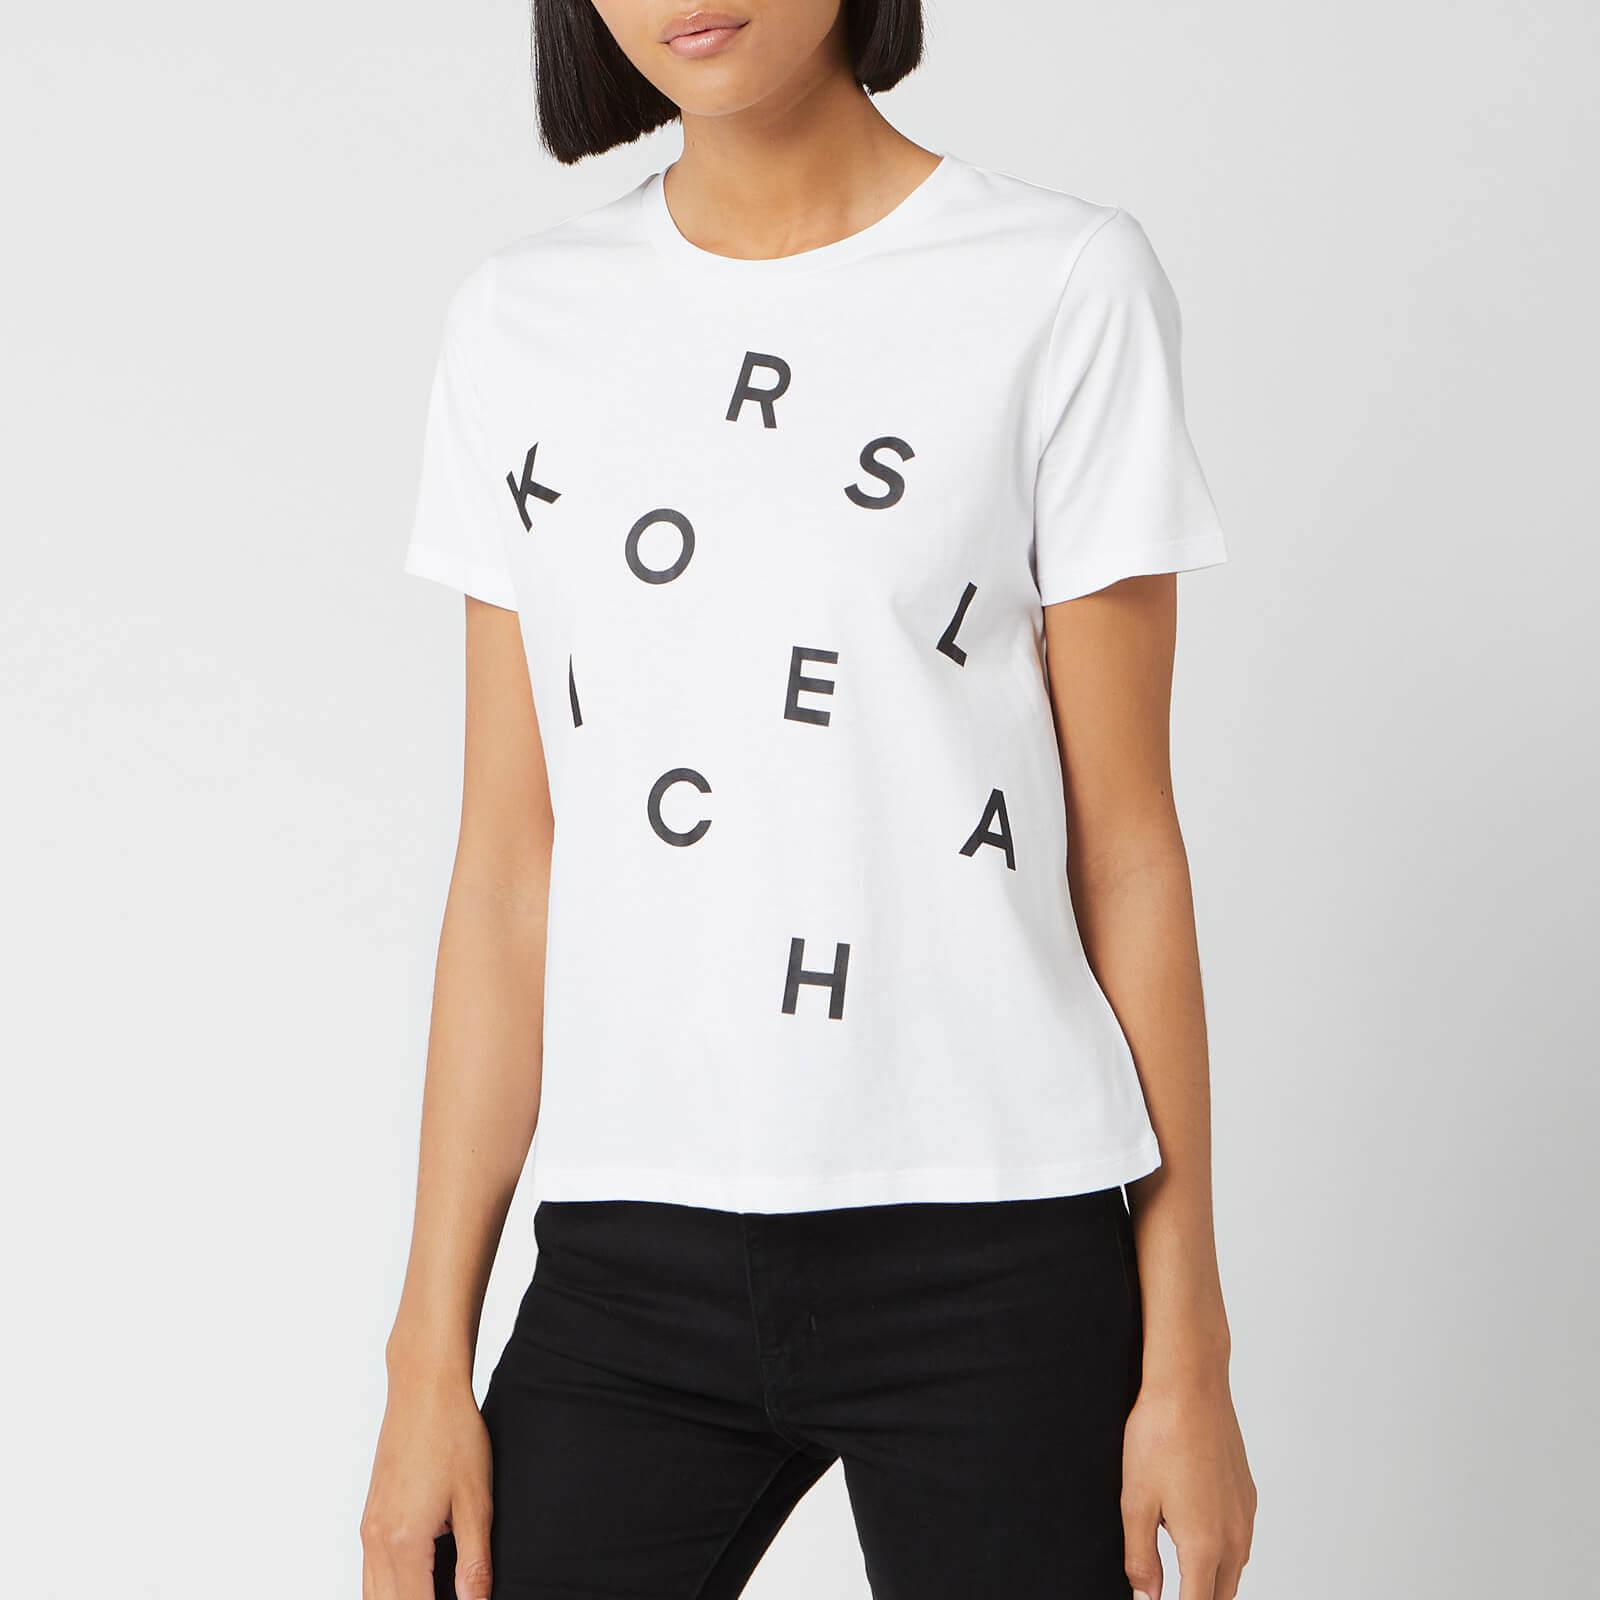 MICHAEL MICHAEL KORS Women's Tossed Graphic Baby T-Shirt - White - L - White